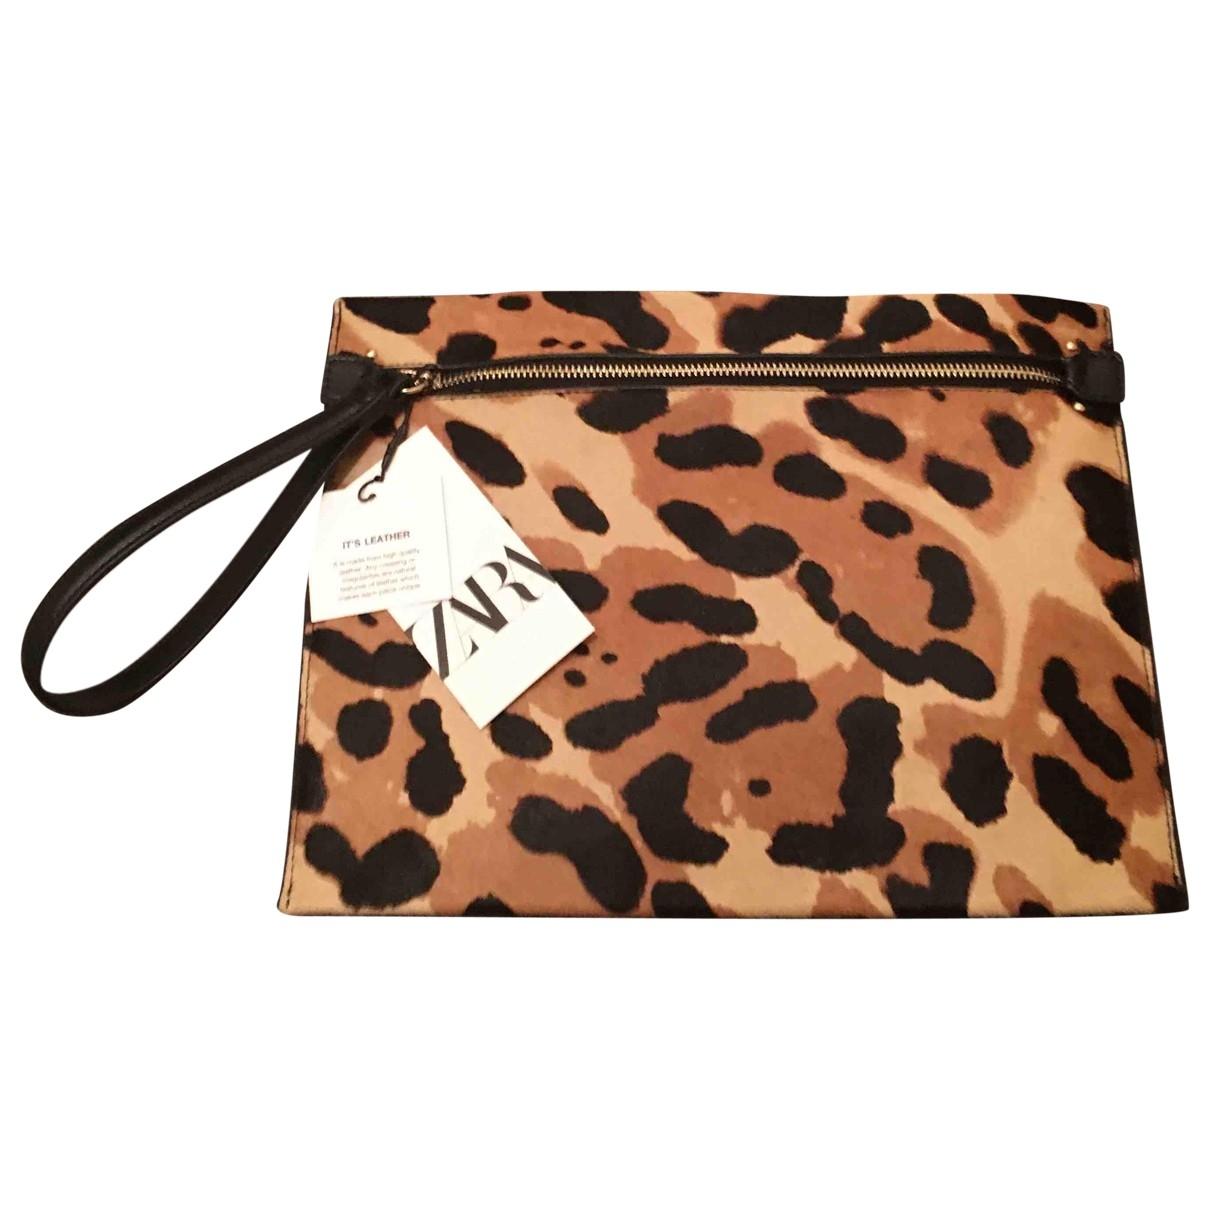 Zara \N Pony-style calfskin Clutch bag for Women \N